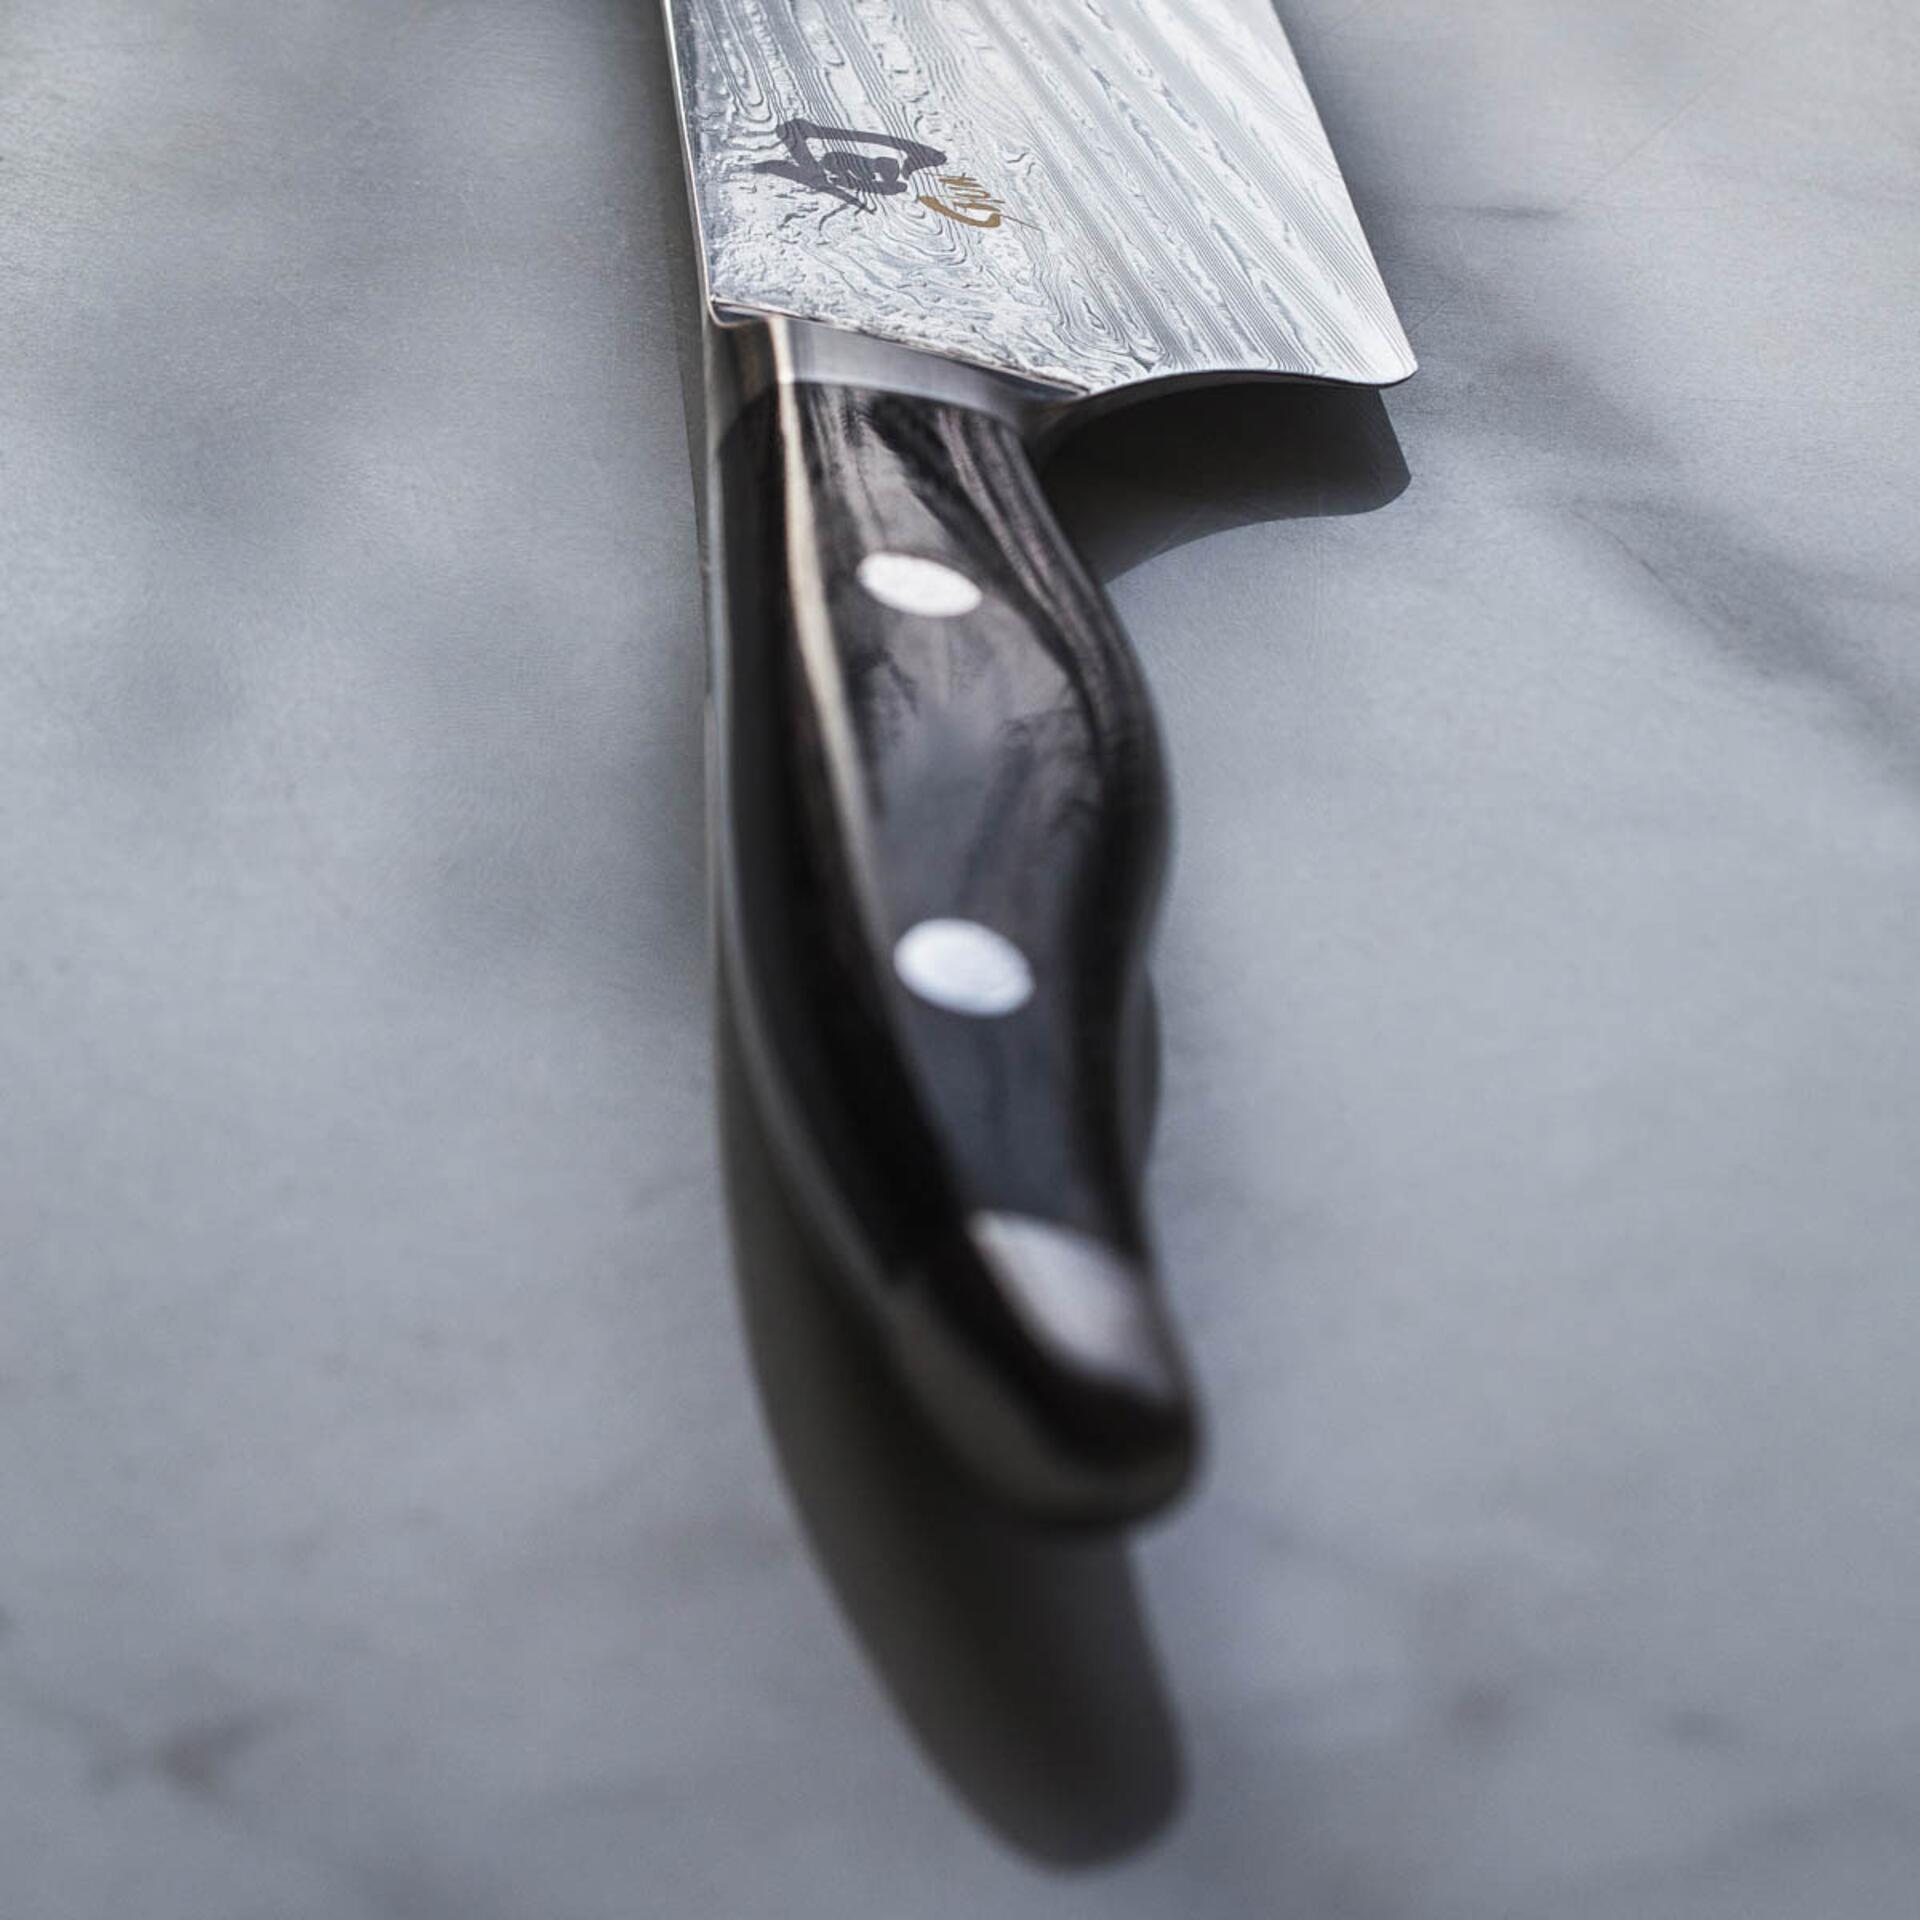 KAI Shun Nagare Allzweckmesser 15 cm NDC-0701